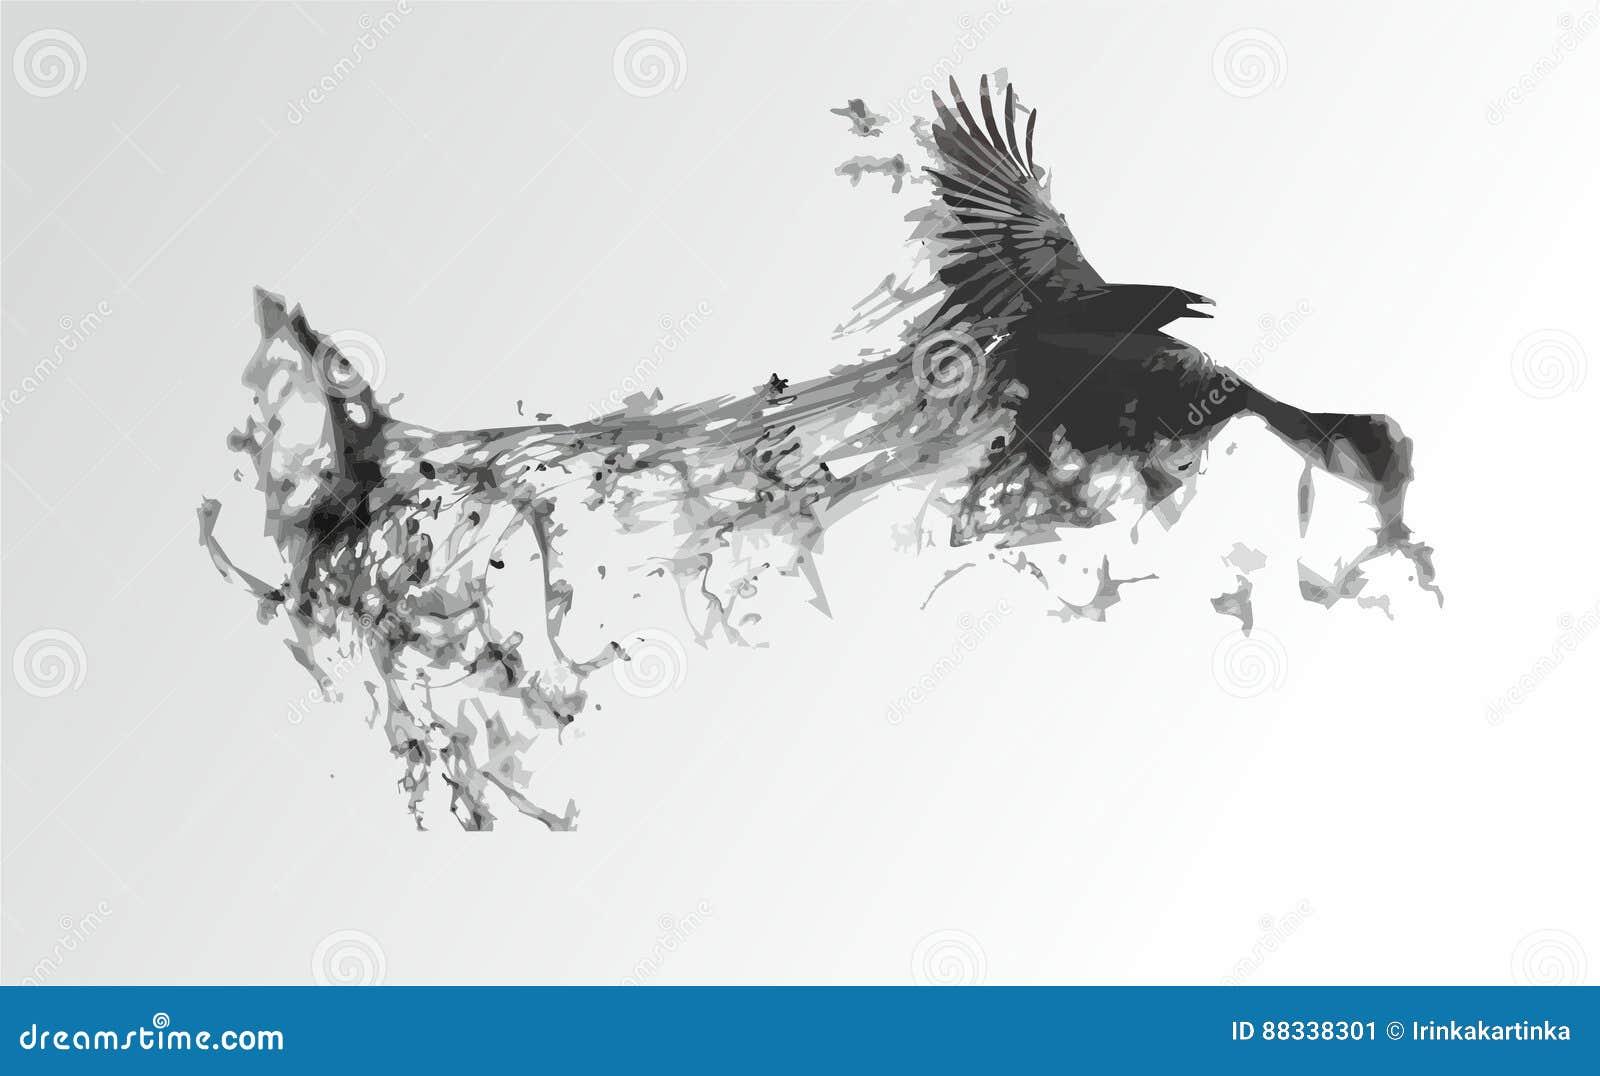 Svart fågel på en vit bakgrund